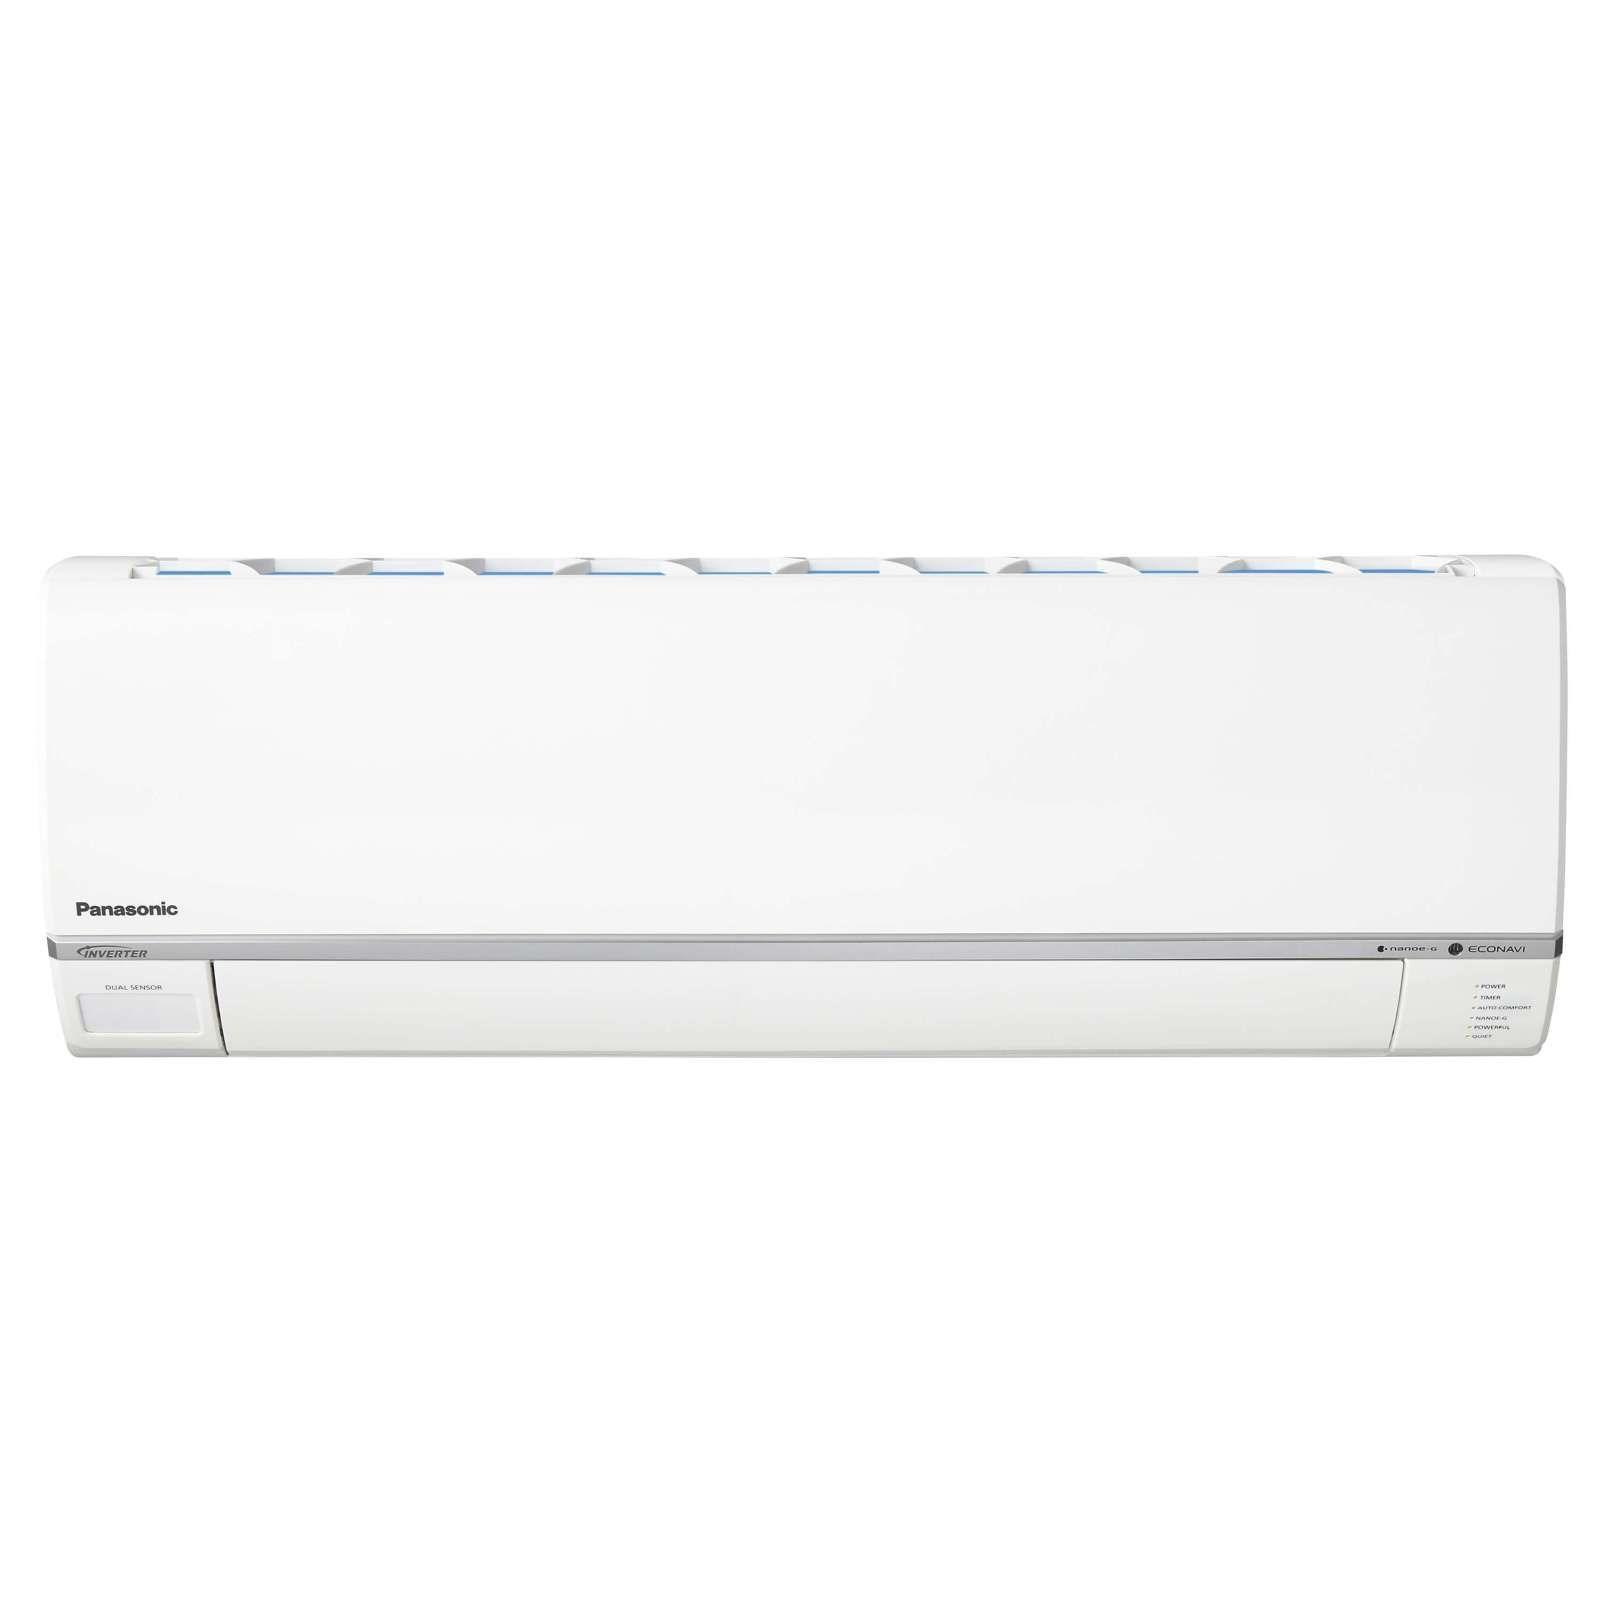 Panasonic (XS-Series Premium Inverter) – SYSTEM 4 AIRCON (CU-4XS30UBZ / CS-MXS9UKZ X3 / CS-MXS18UKZ)